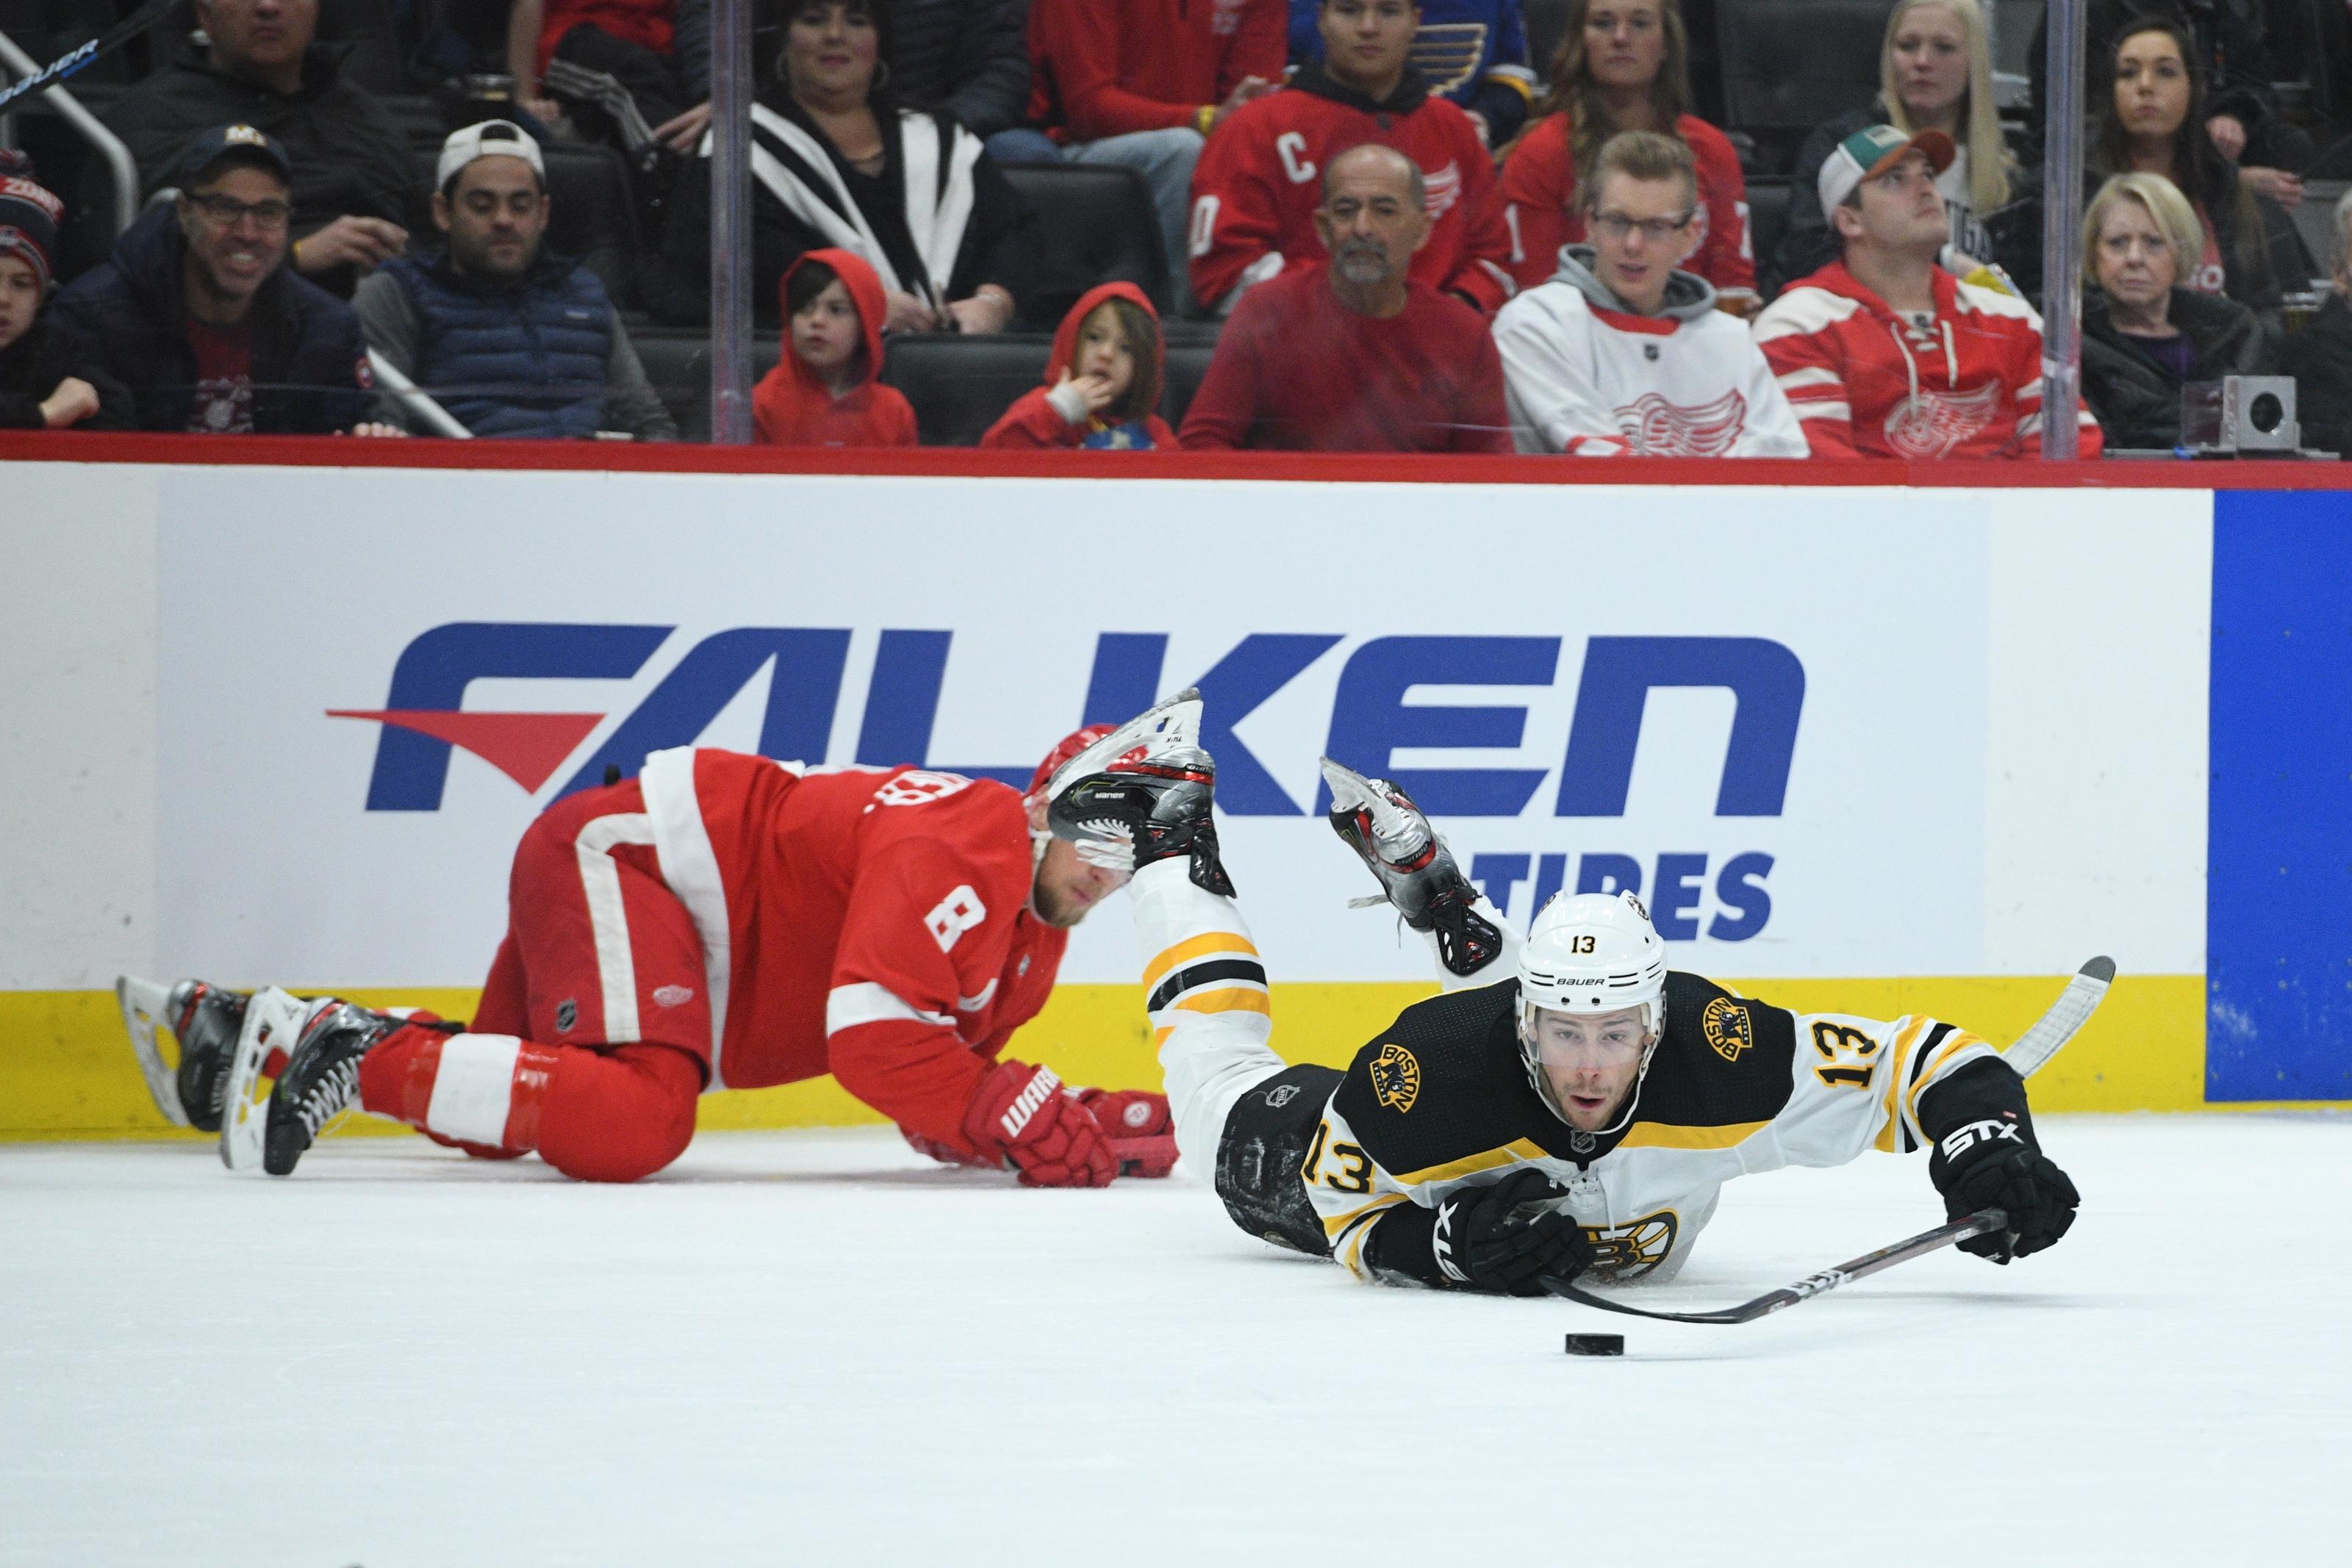 NHL: Boston Bruins at Detroit Red Wings